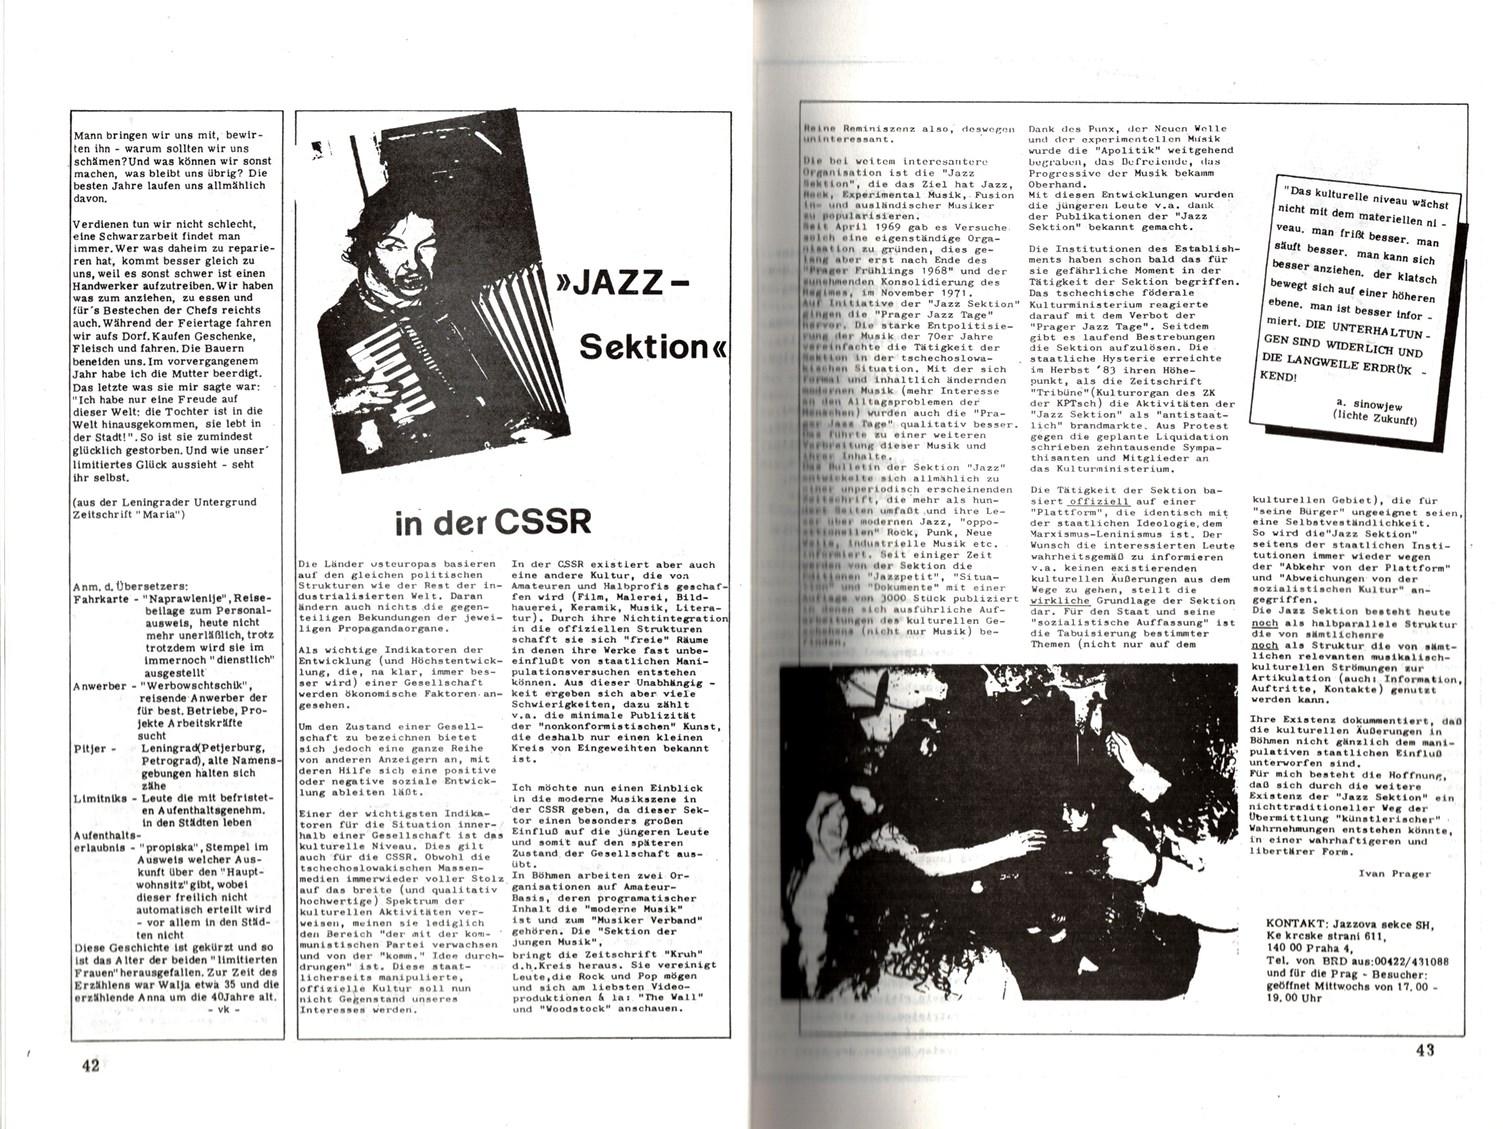 Frankfurt_Aktion_19850200_002_023